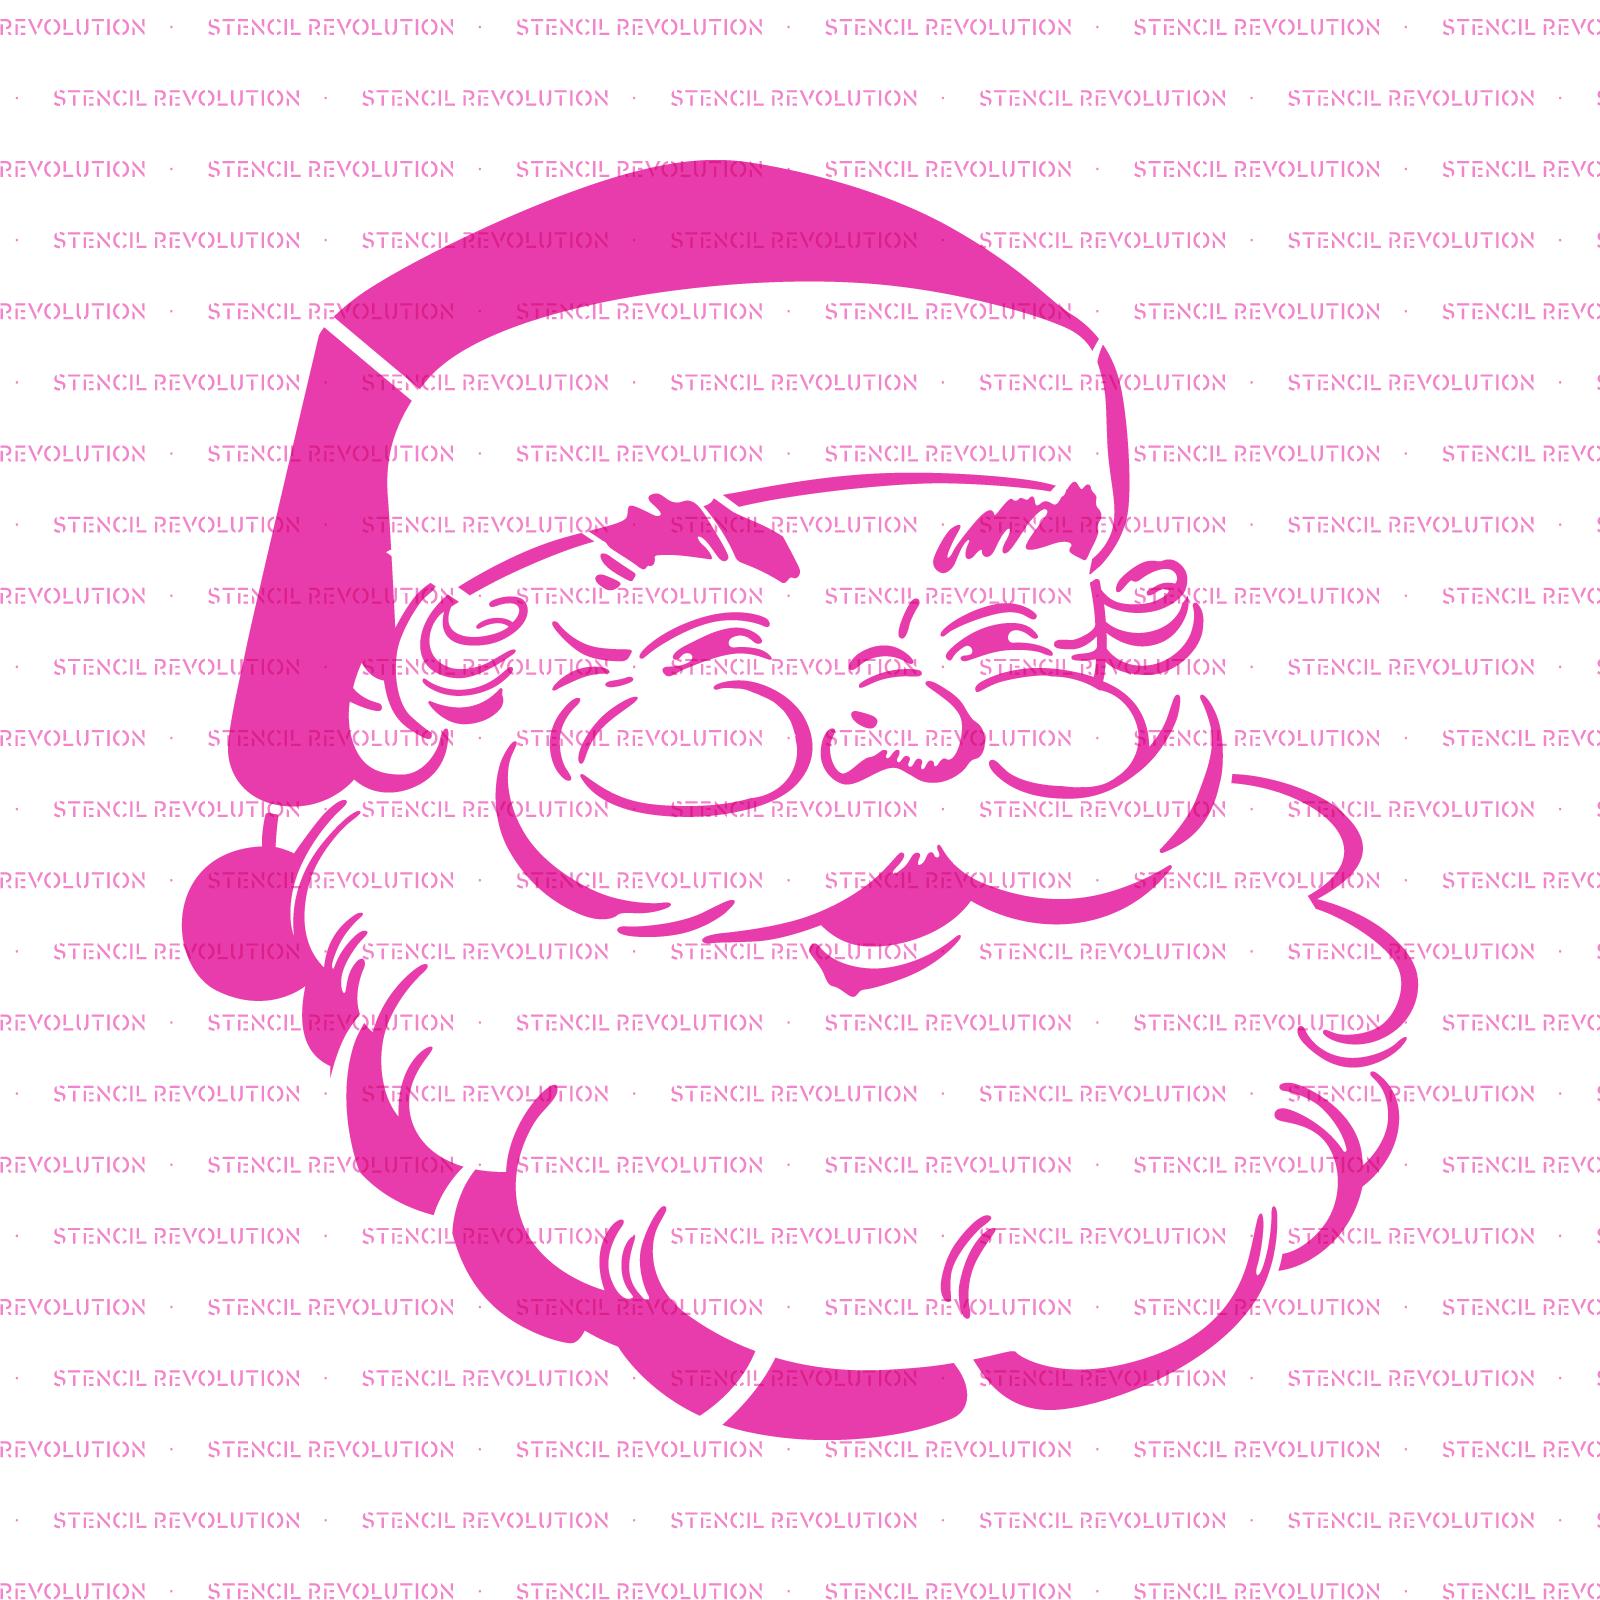 Santa Claus Stencil - Reusable Stencils of Santa Claus in Multiple Sizes